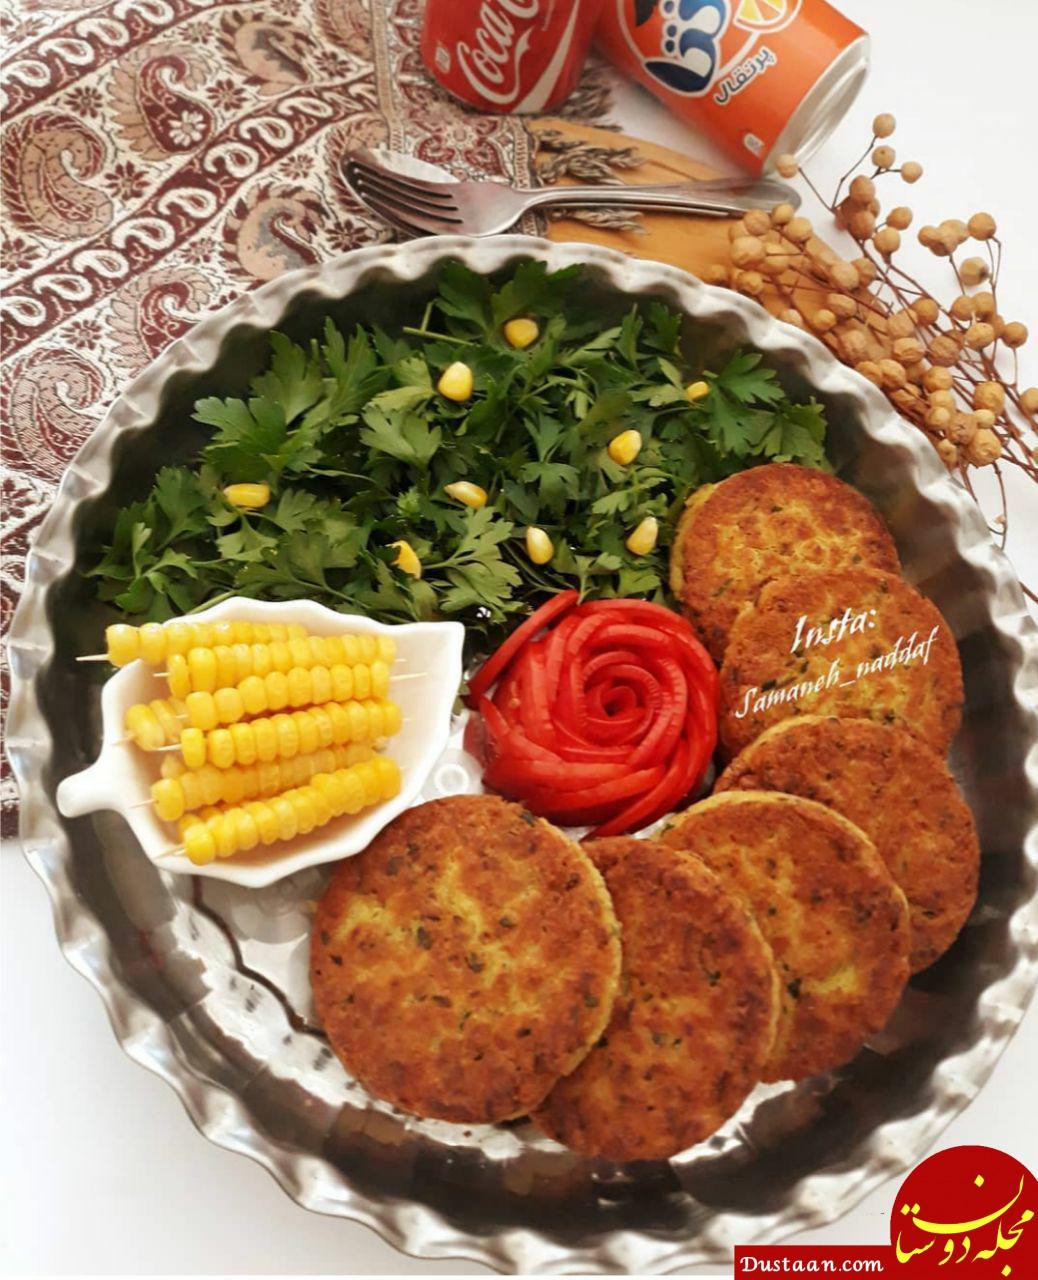 www.dustaan.com طرز تهیه کتلت لوبیا سفید به سبکی خوشمزه و متفاوت